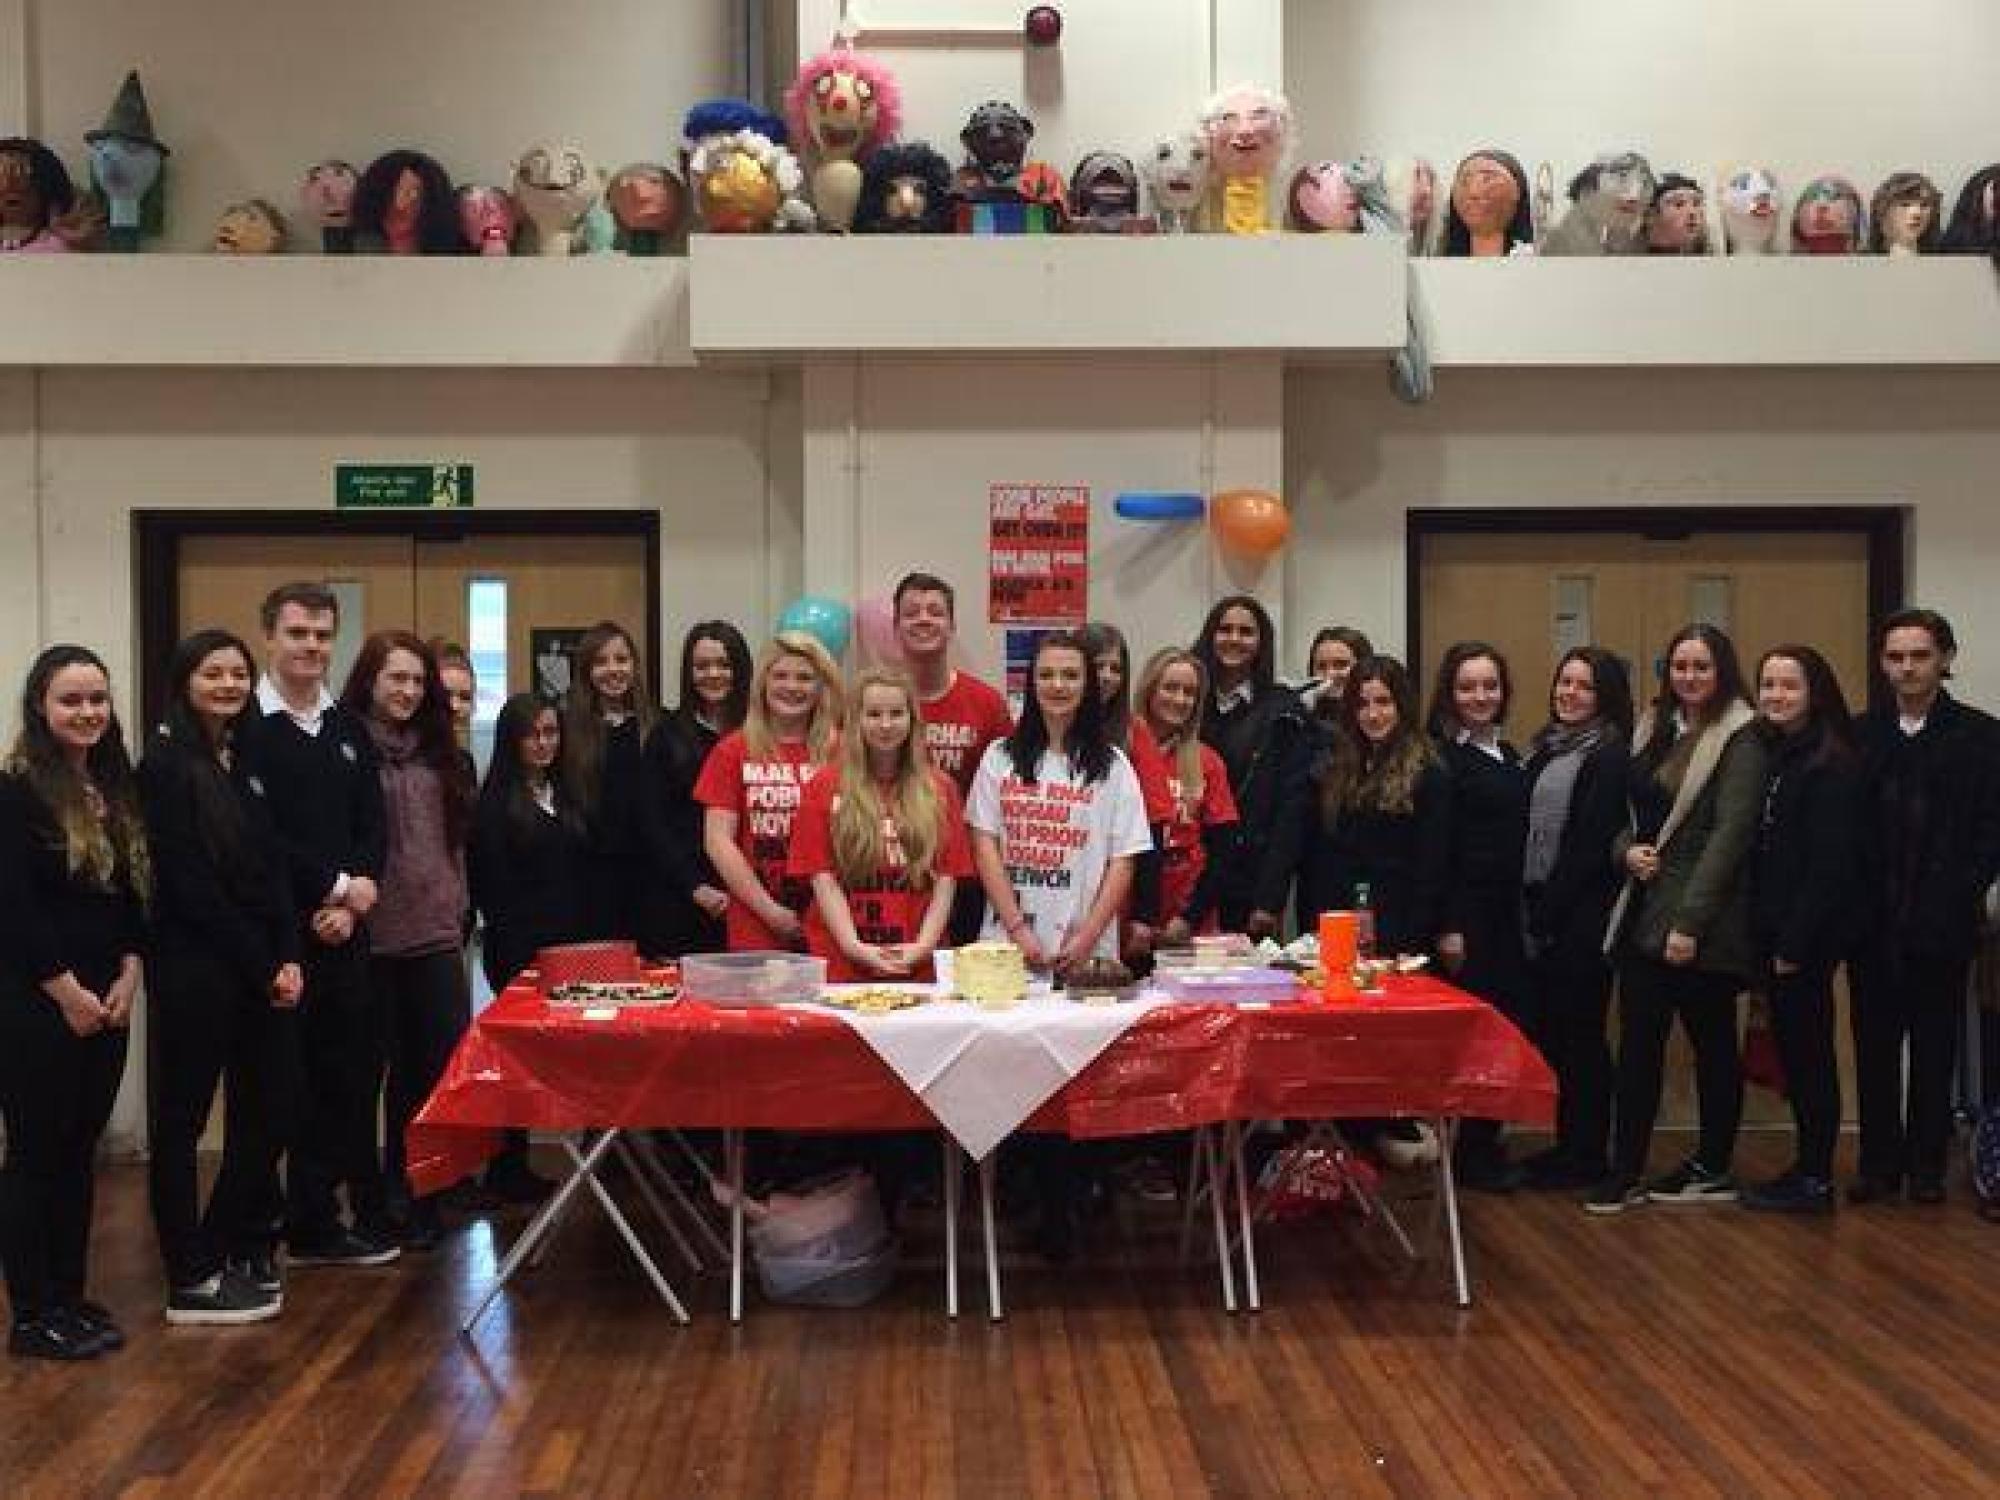 Stonewall Cymru fundraisers at a charity bake sale 2015